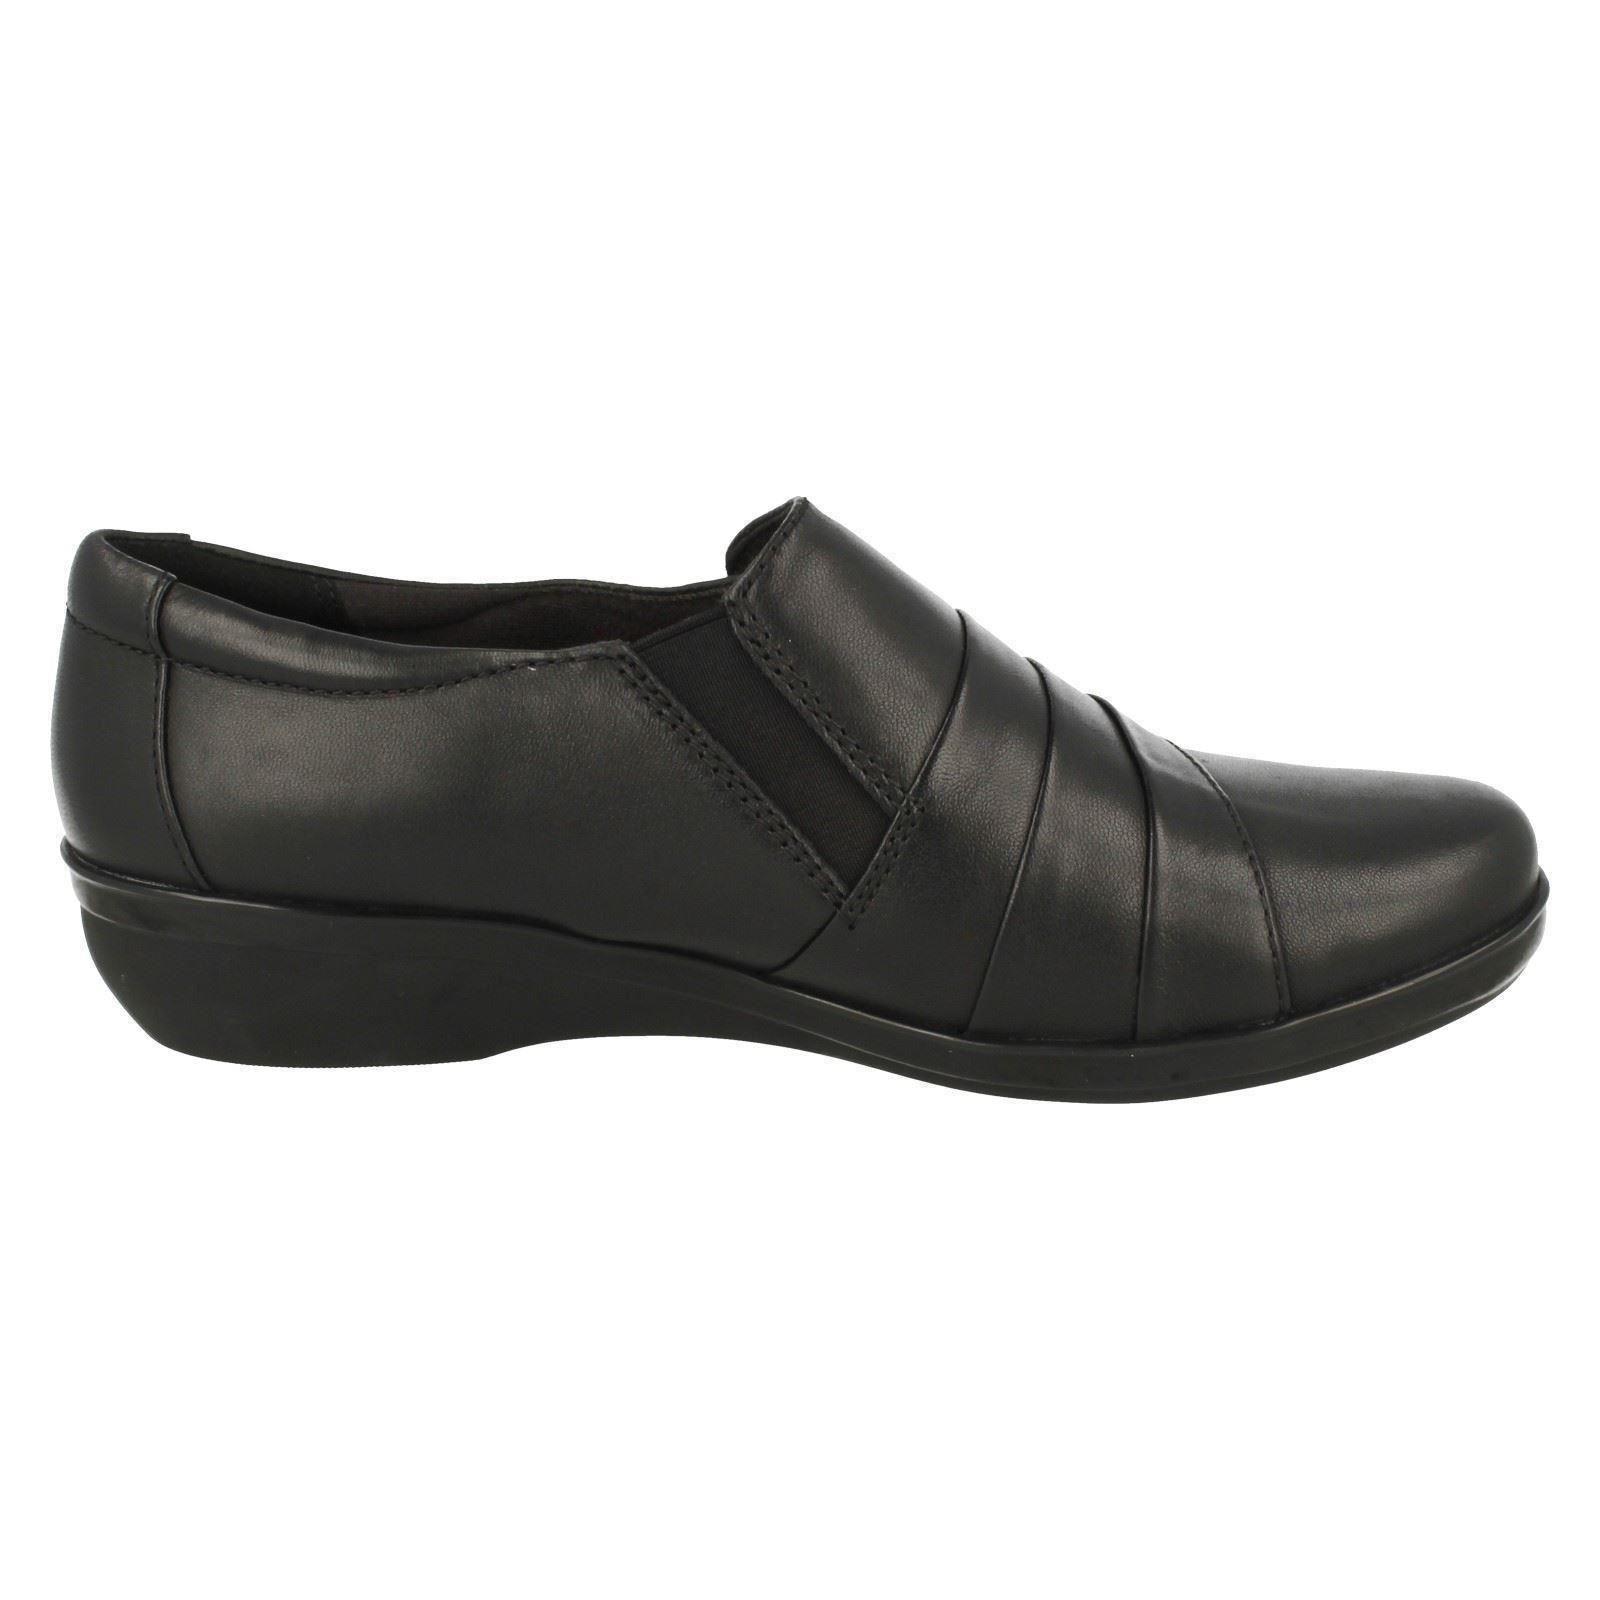 Cuña Baja Mujer Cuña Mujer Clarks Zapatos Baja Zapatos Clarks Formales Formales qUanE0w